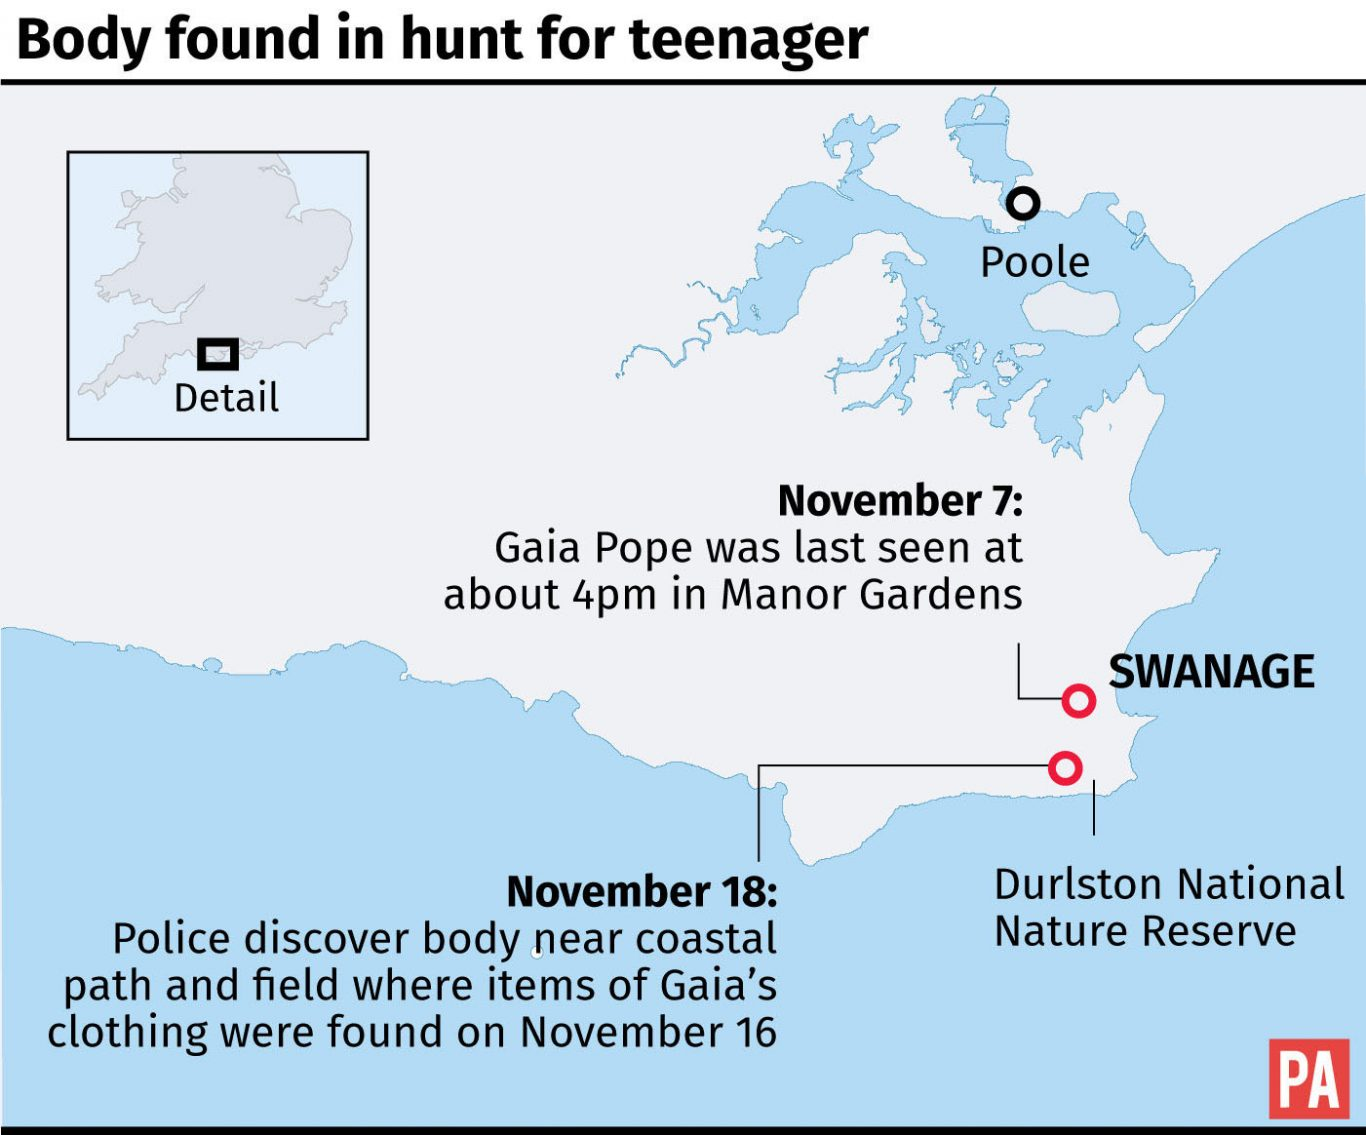 Map locates where a body was found